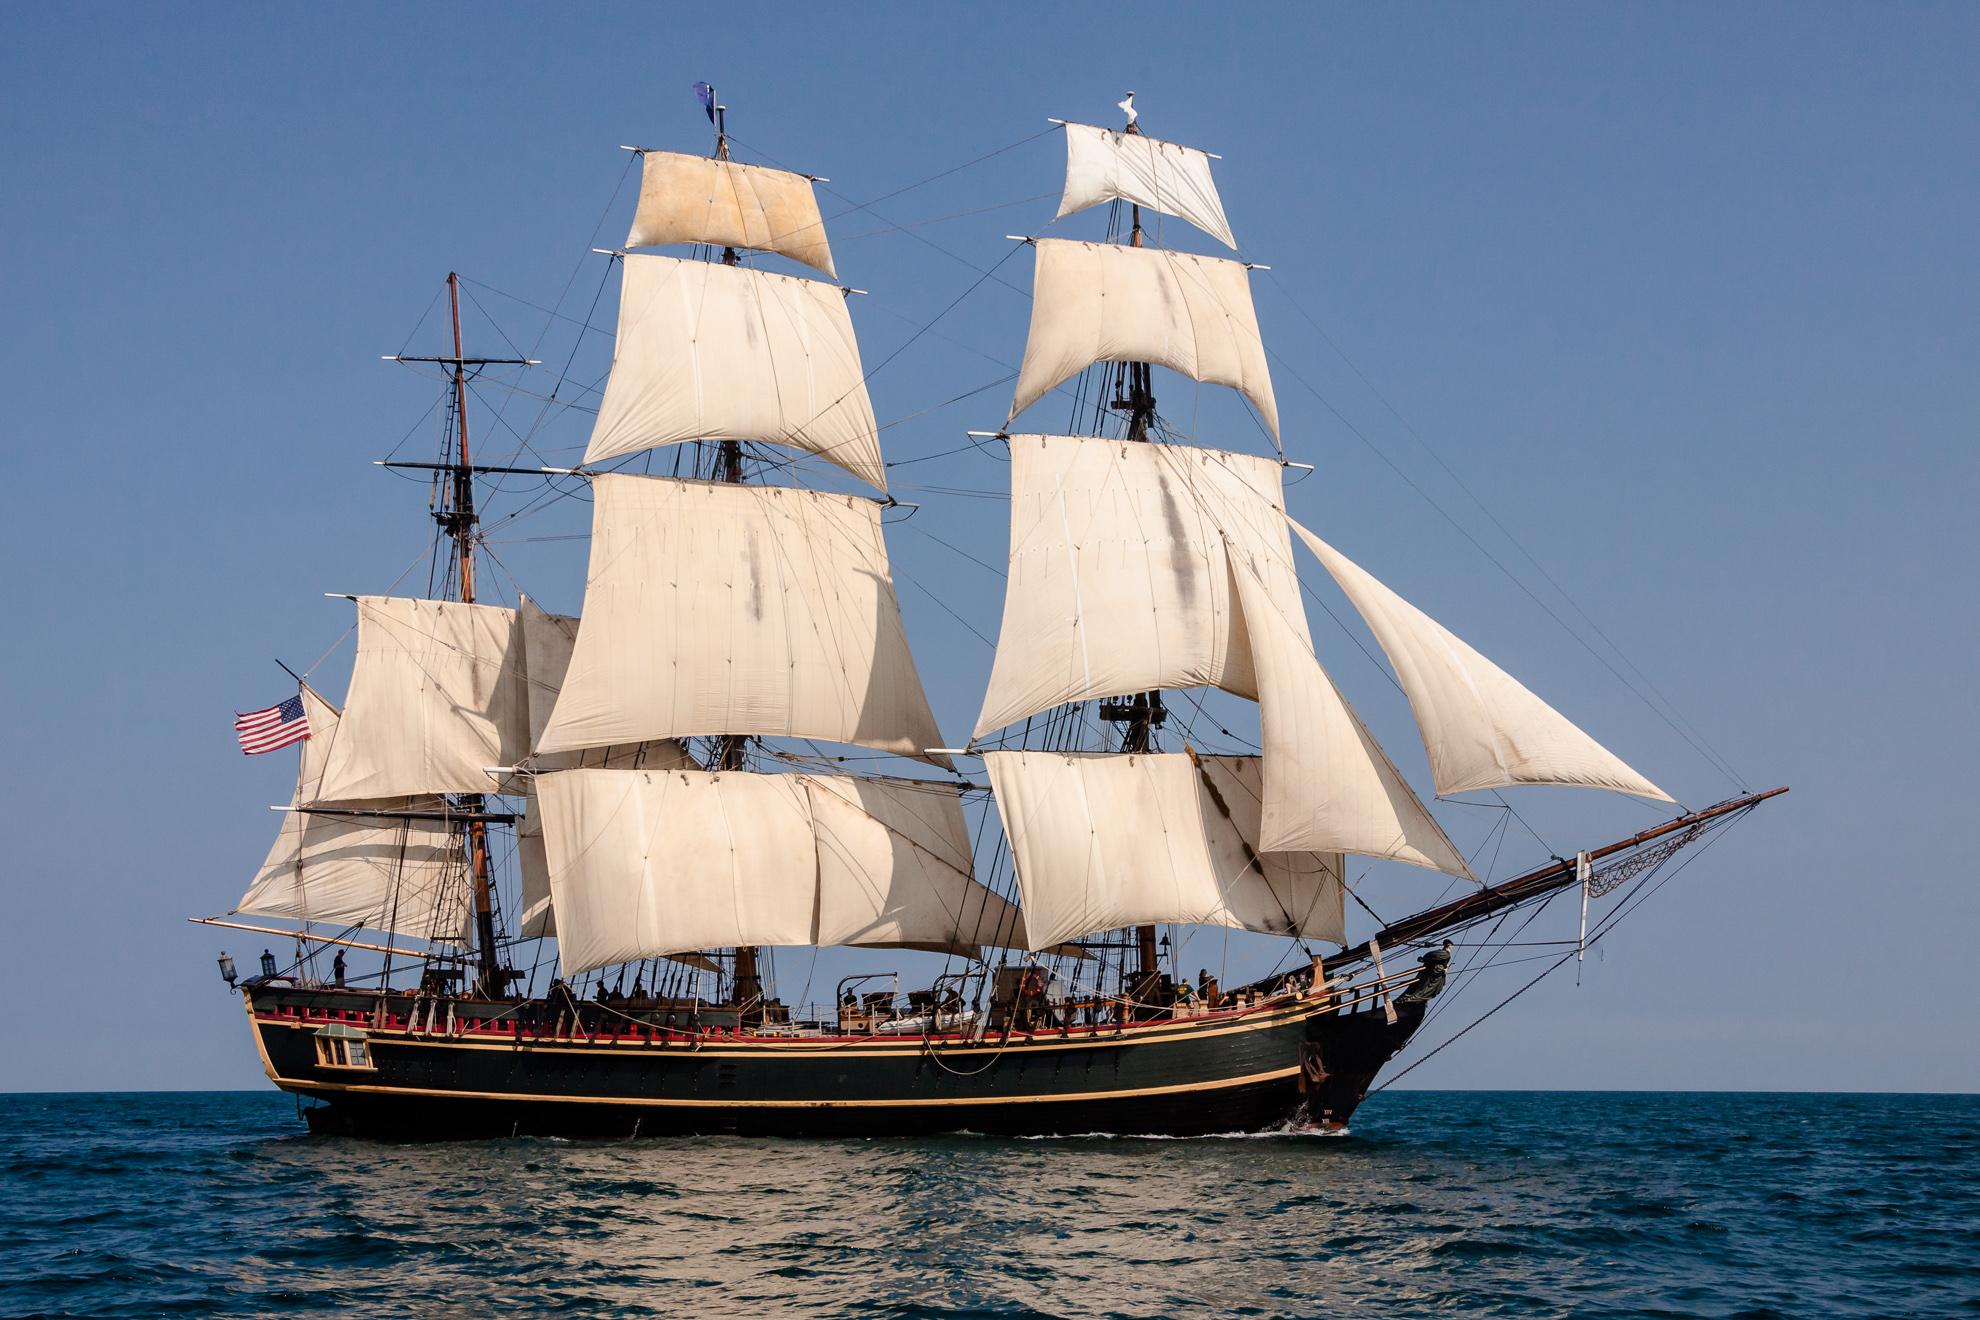 HMS_BOUNTY_II_with_Full_Sails.jpg